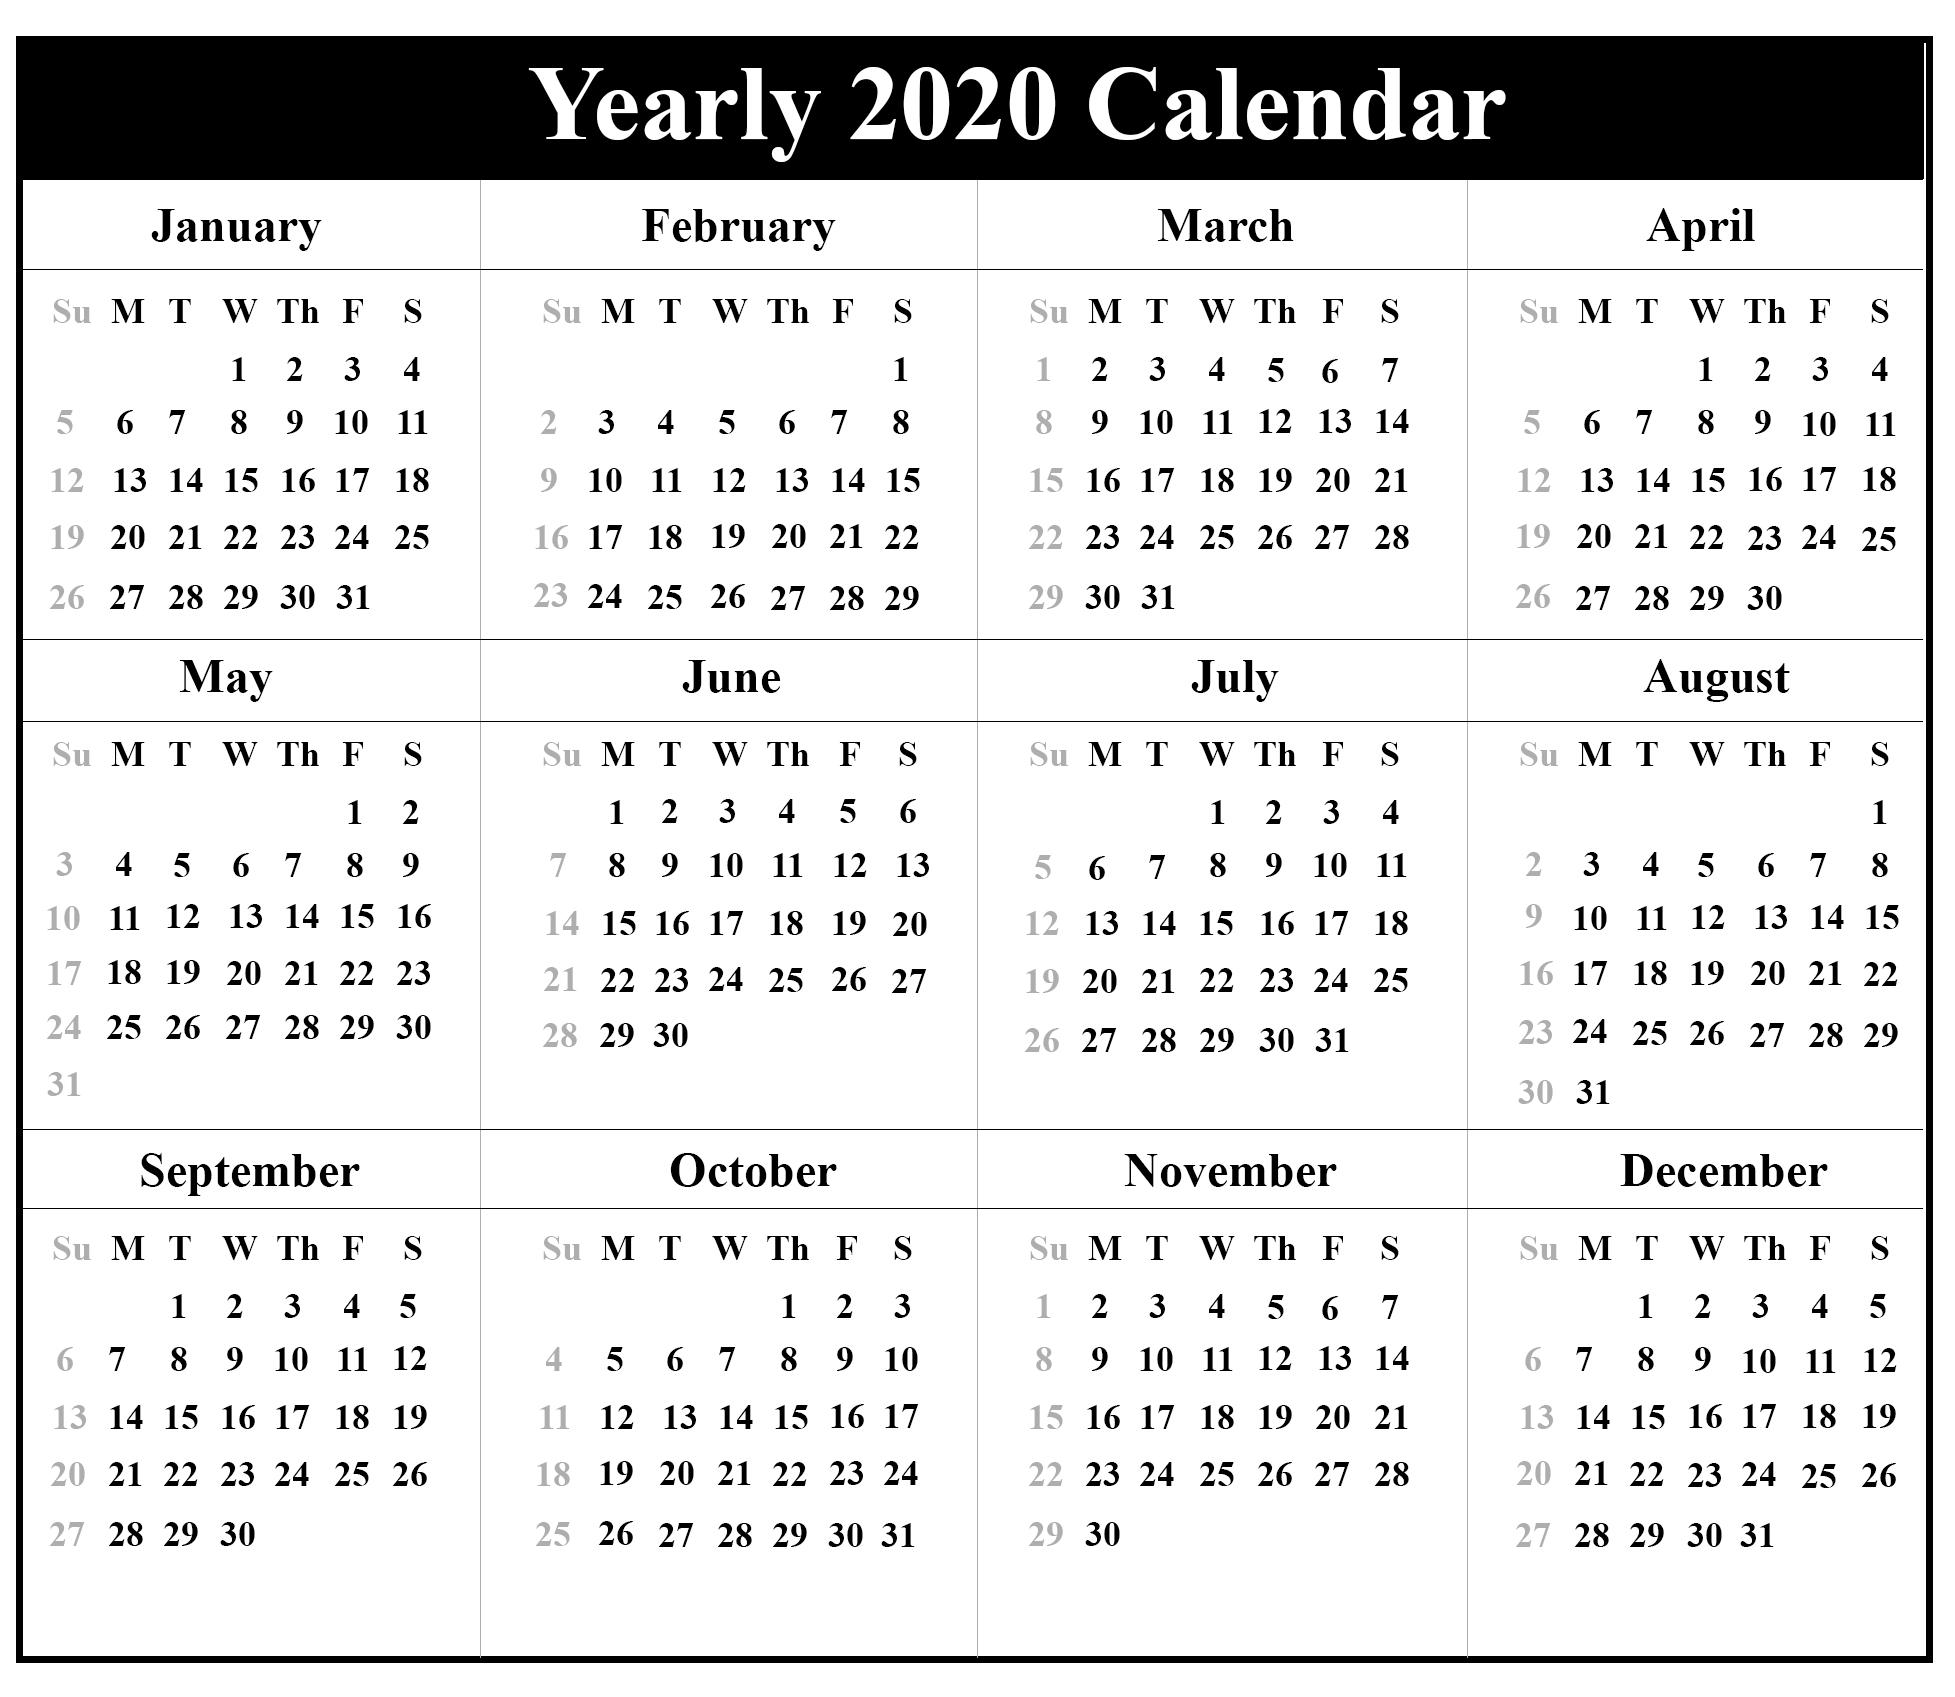 Blank Calendar 2020 Monthly Printable | 12 Month Printable-Blank I 9 Form 2020 Printable